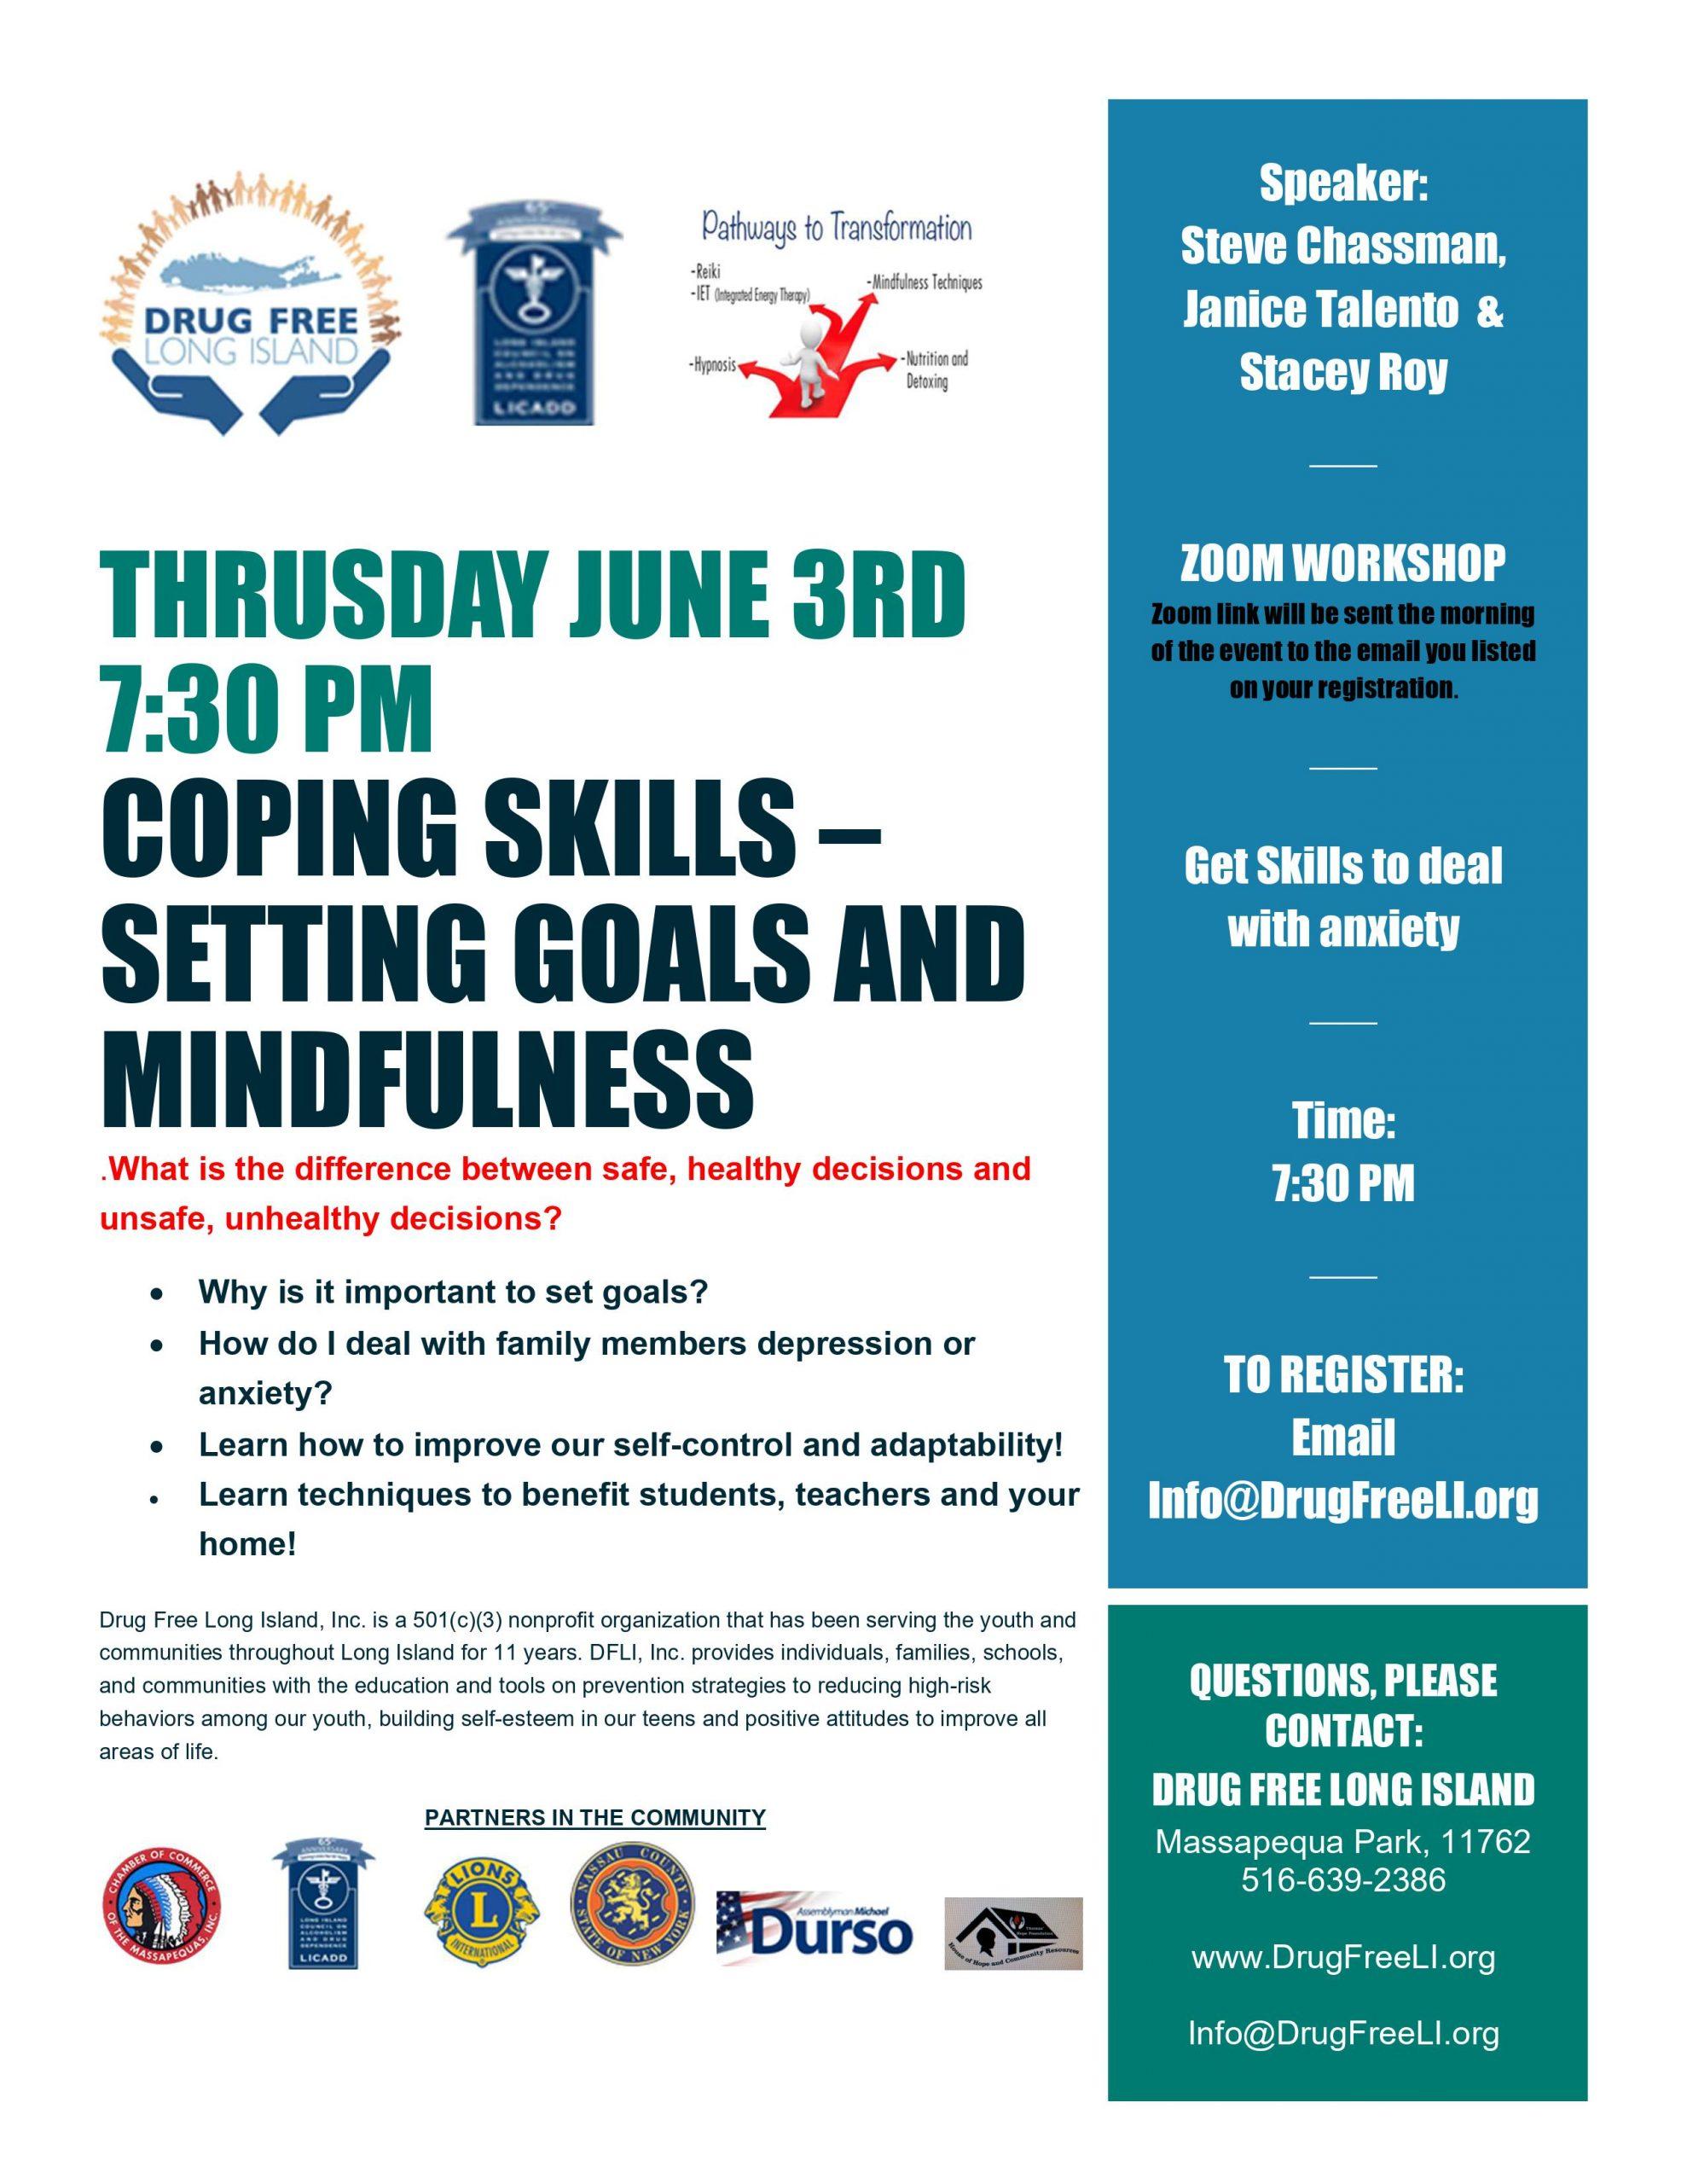 Coping Skills Workshop – Setting Goals and Mindfulness